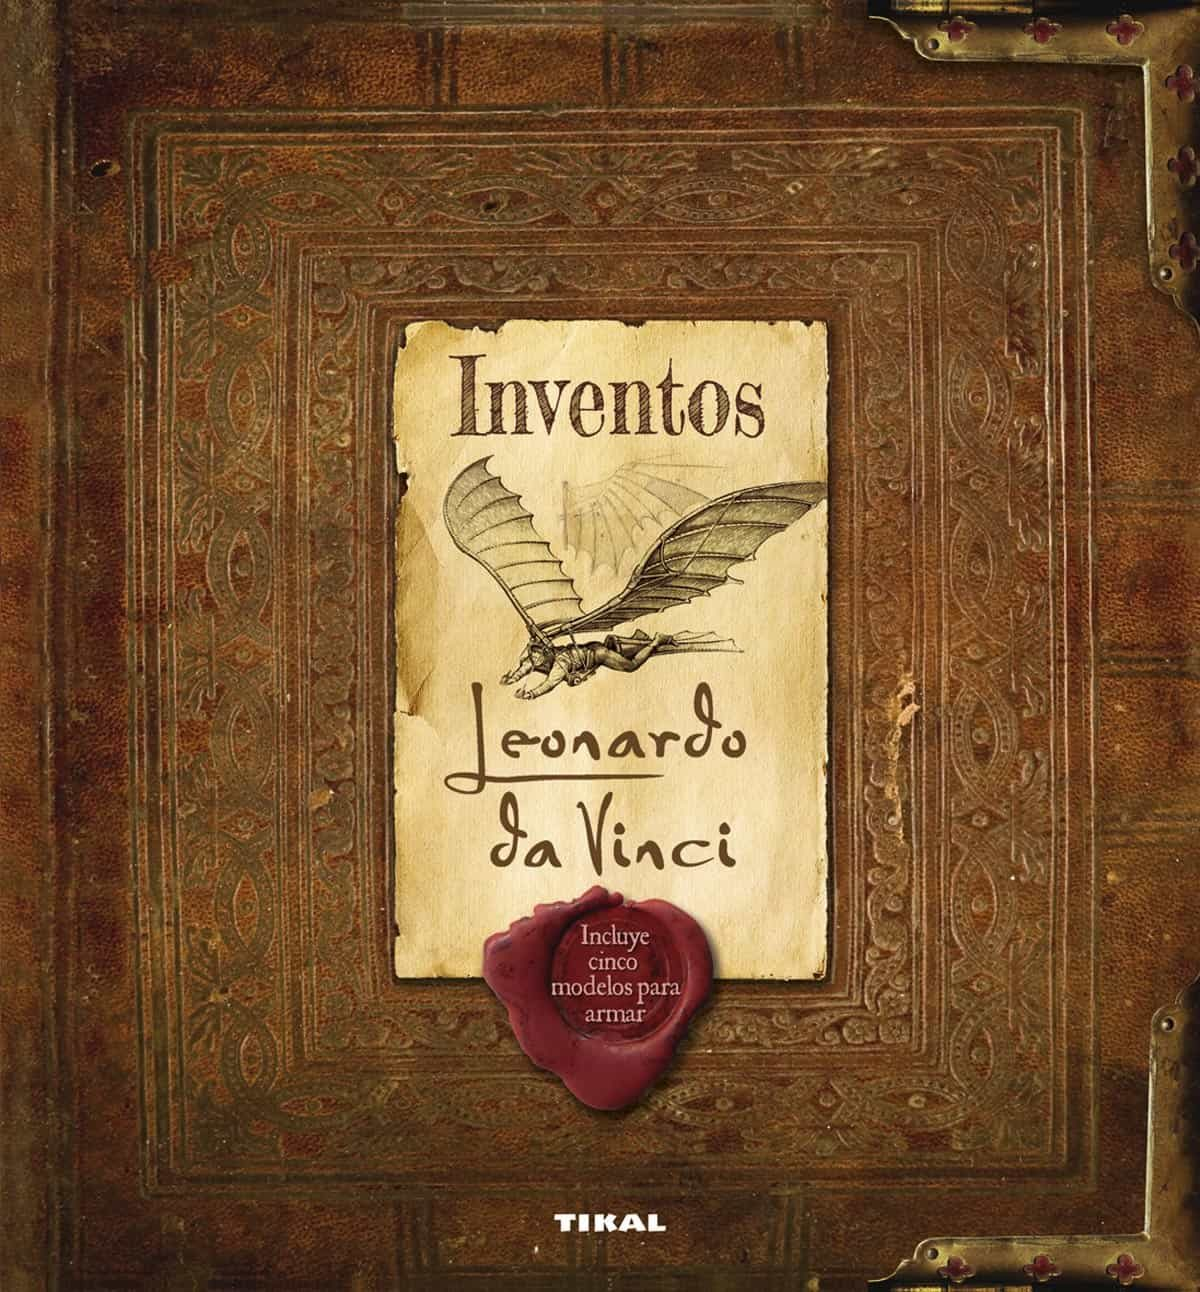 inventos leonardo da vinci libro